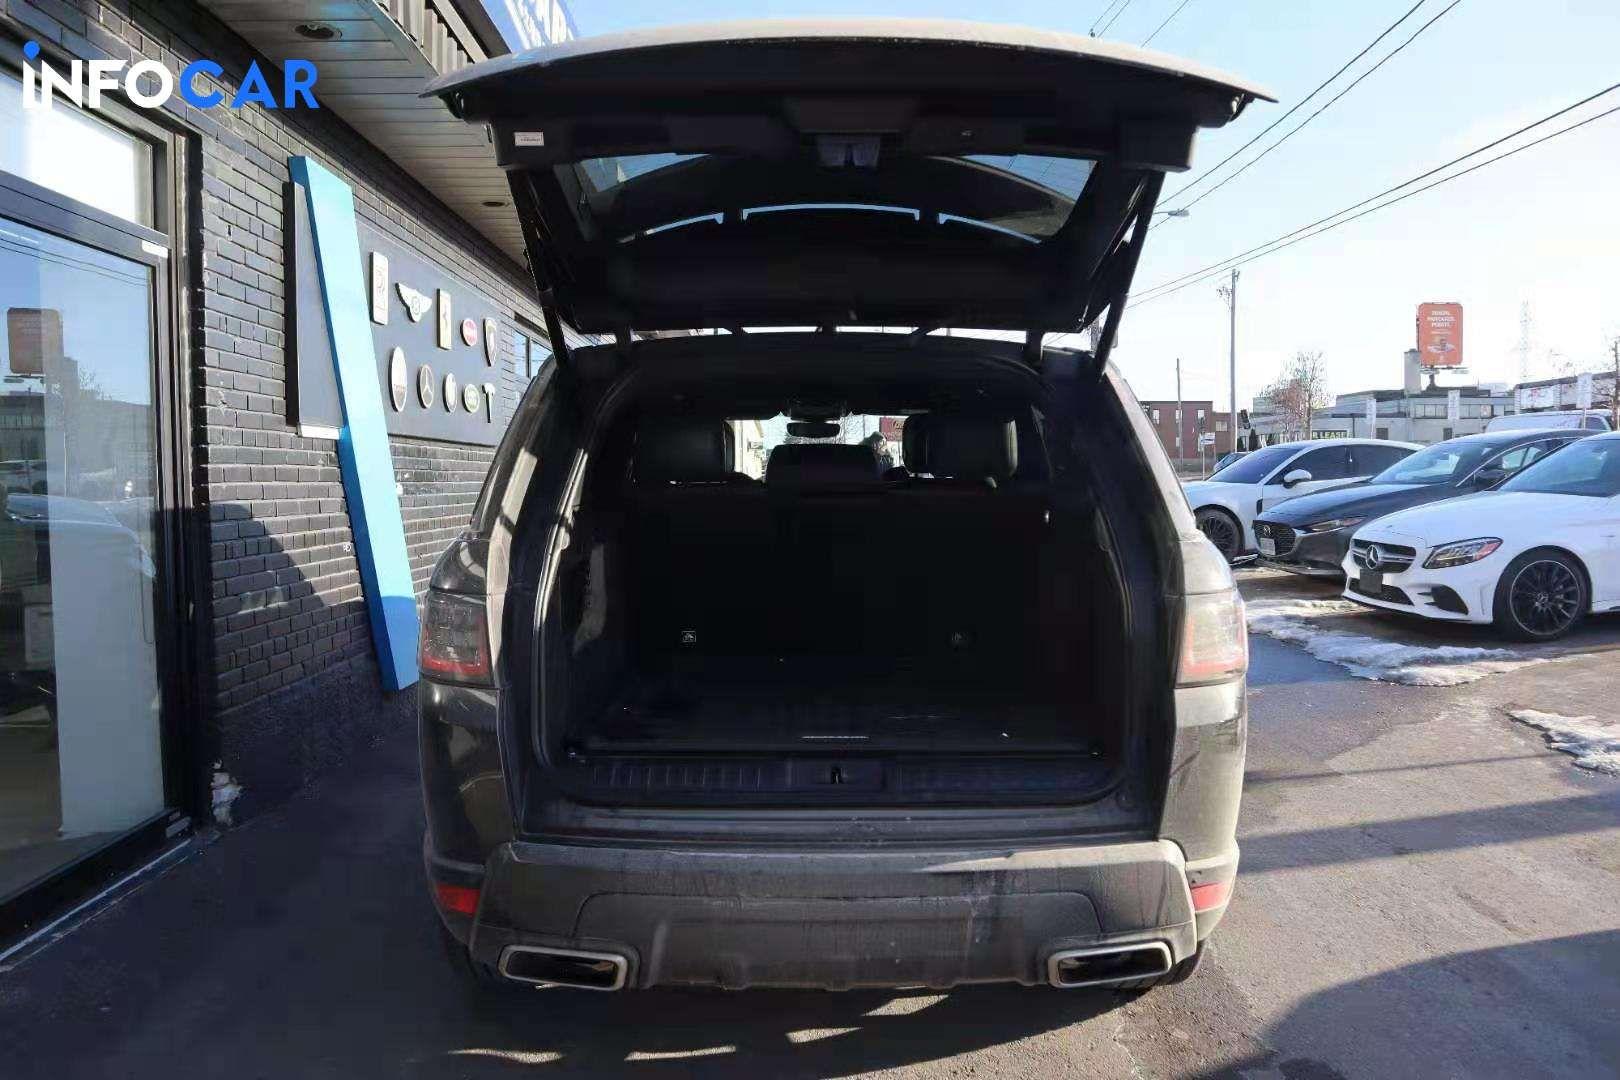 2020 Land Rover Range Rover Sport V8 SC DYNAMIC - INFOCAR - Toronto's Most Comprehensive New and Used Auto Trading Platform